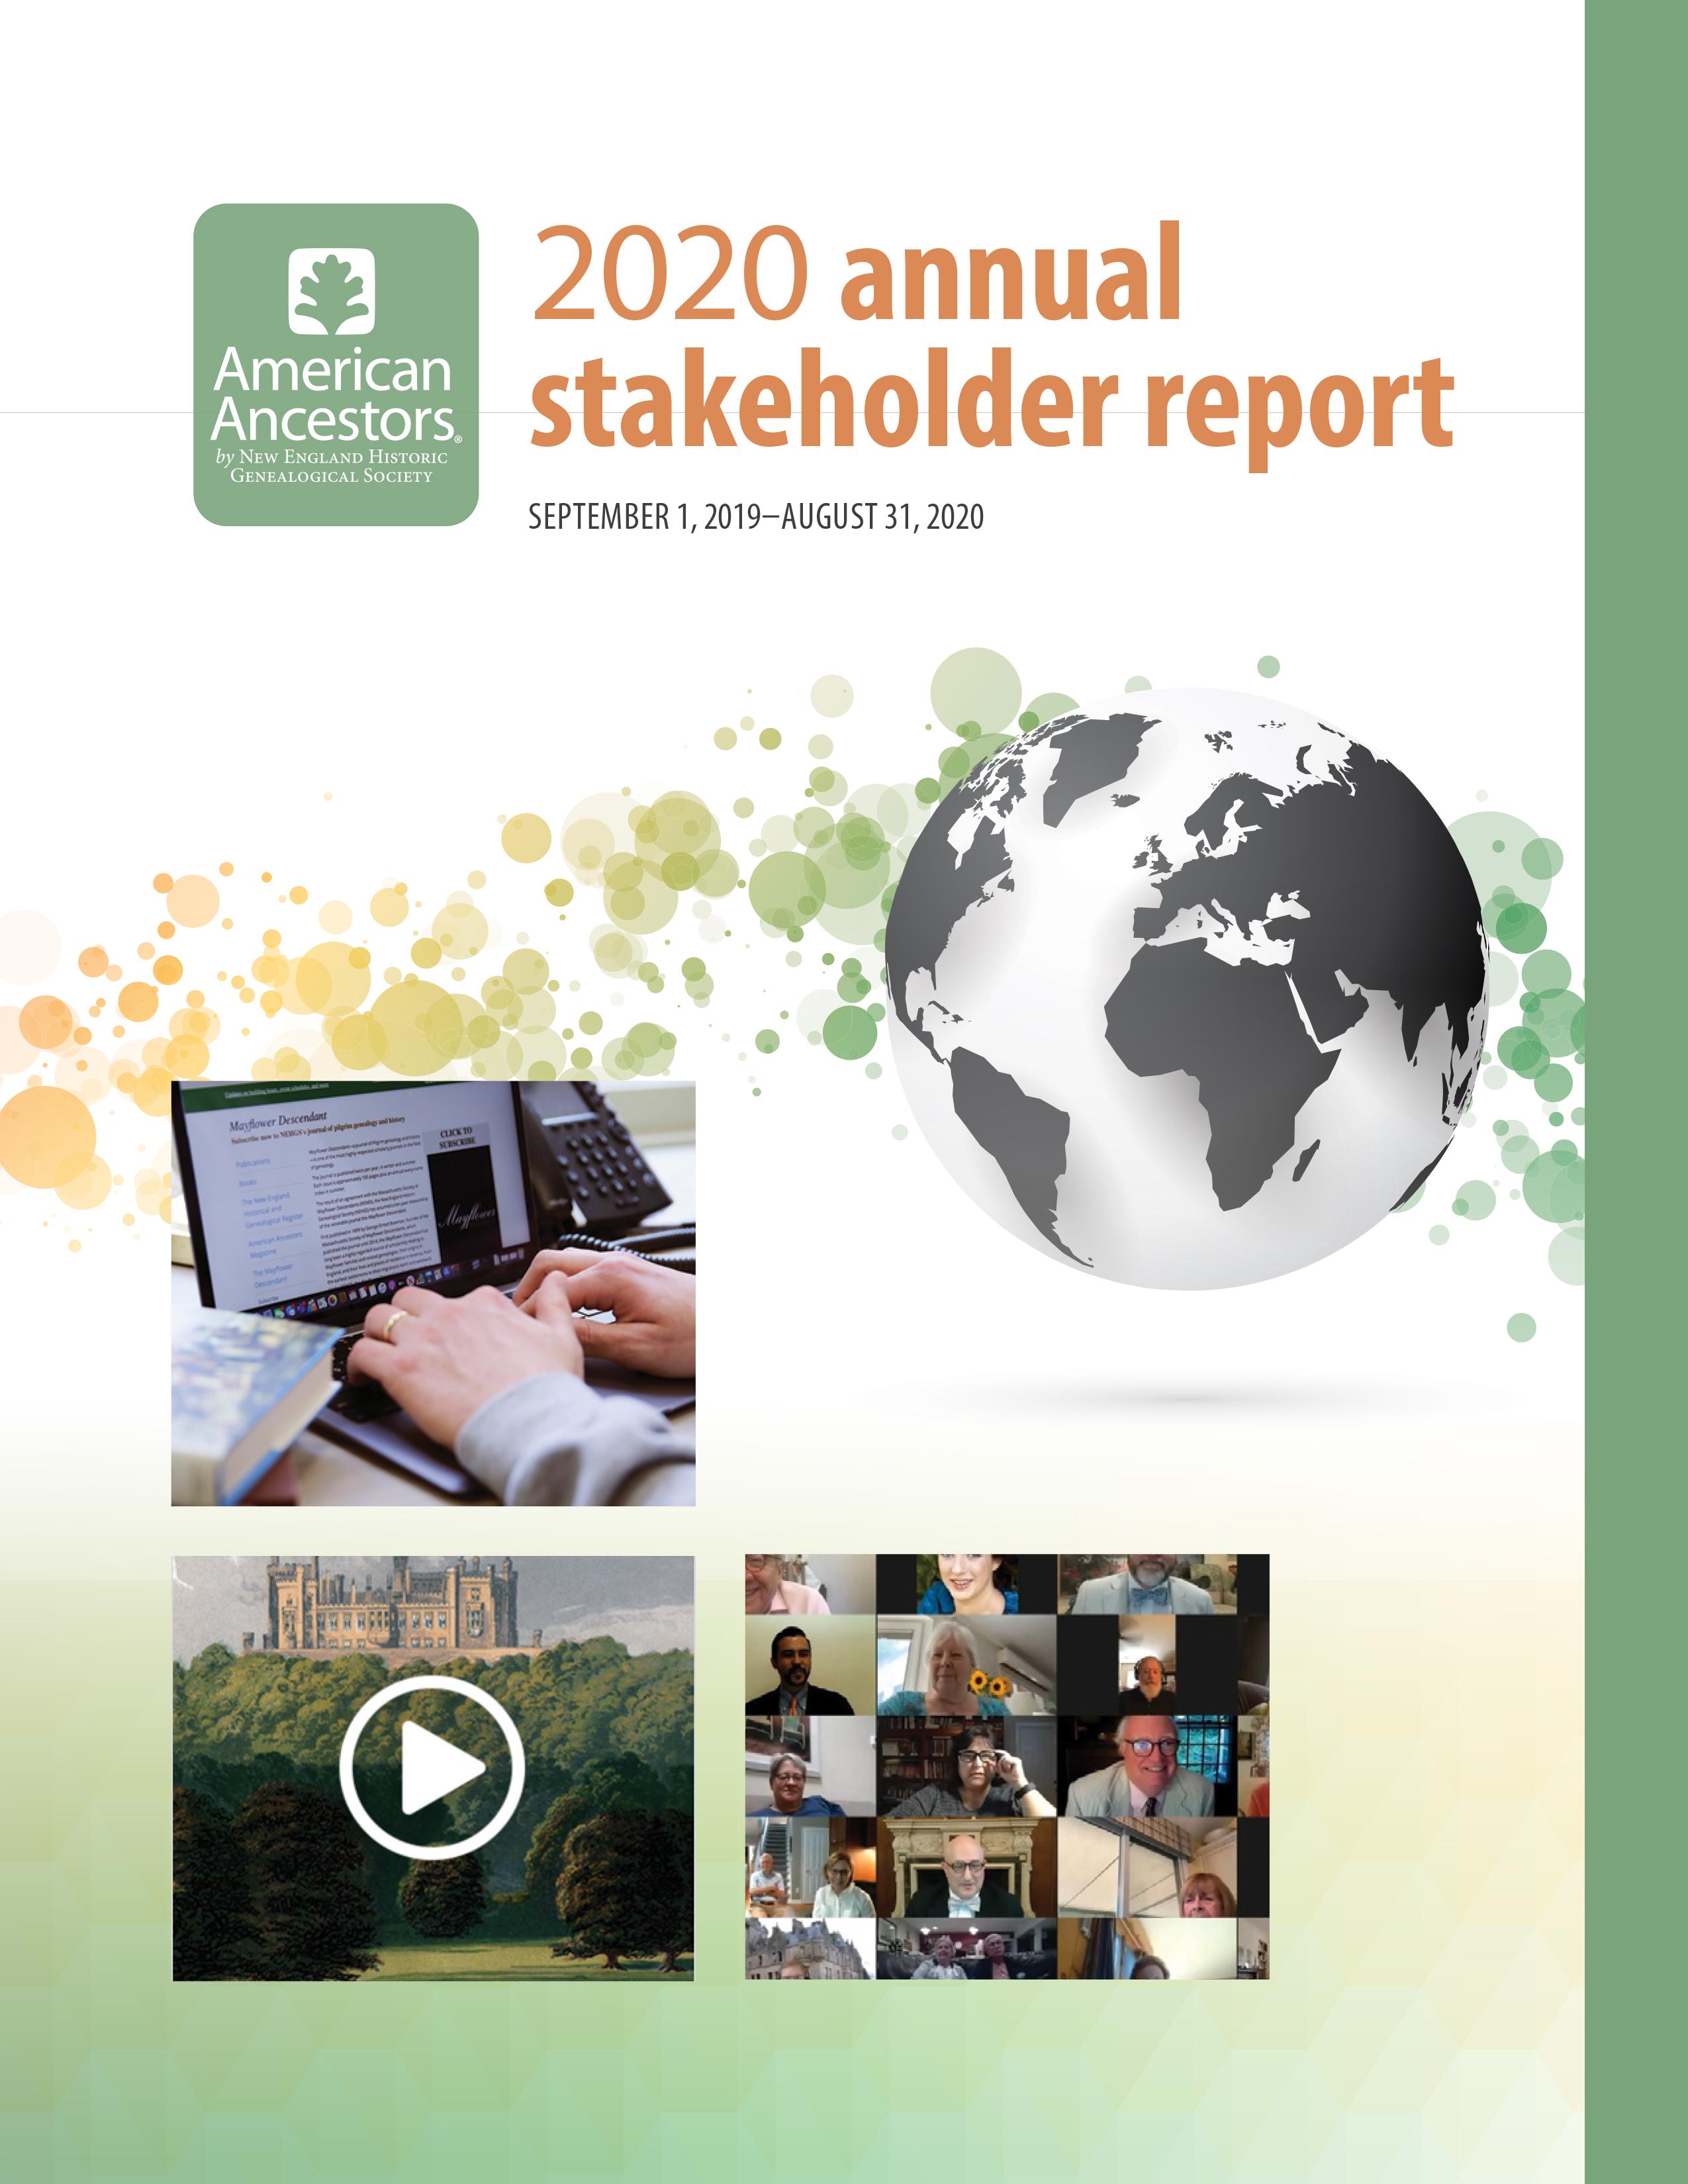 NEHGS 2020 Annual Stakeholder Report